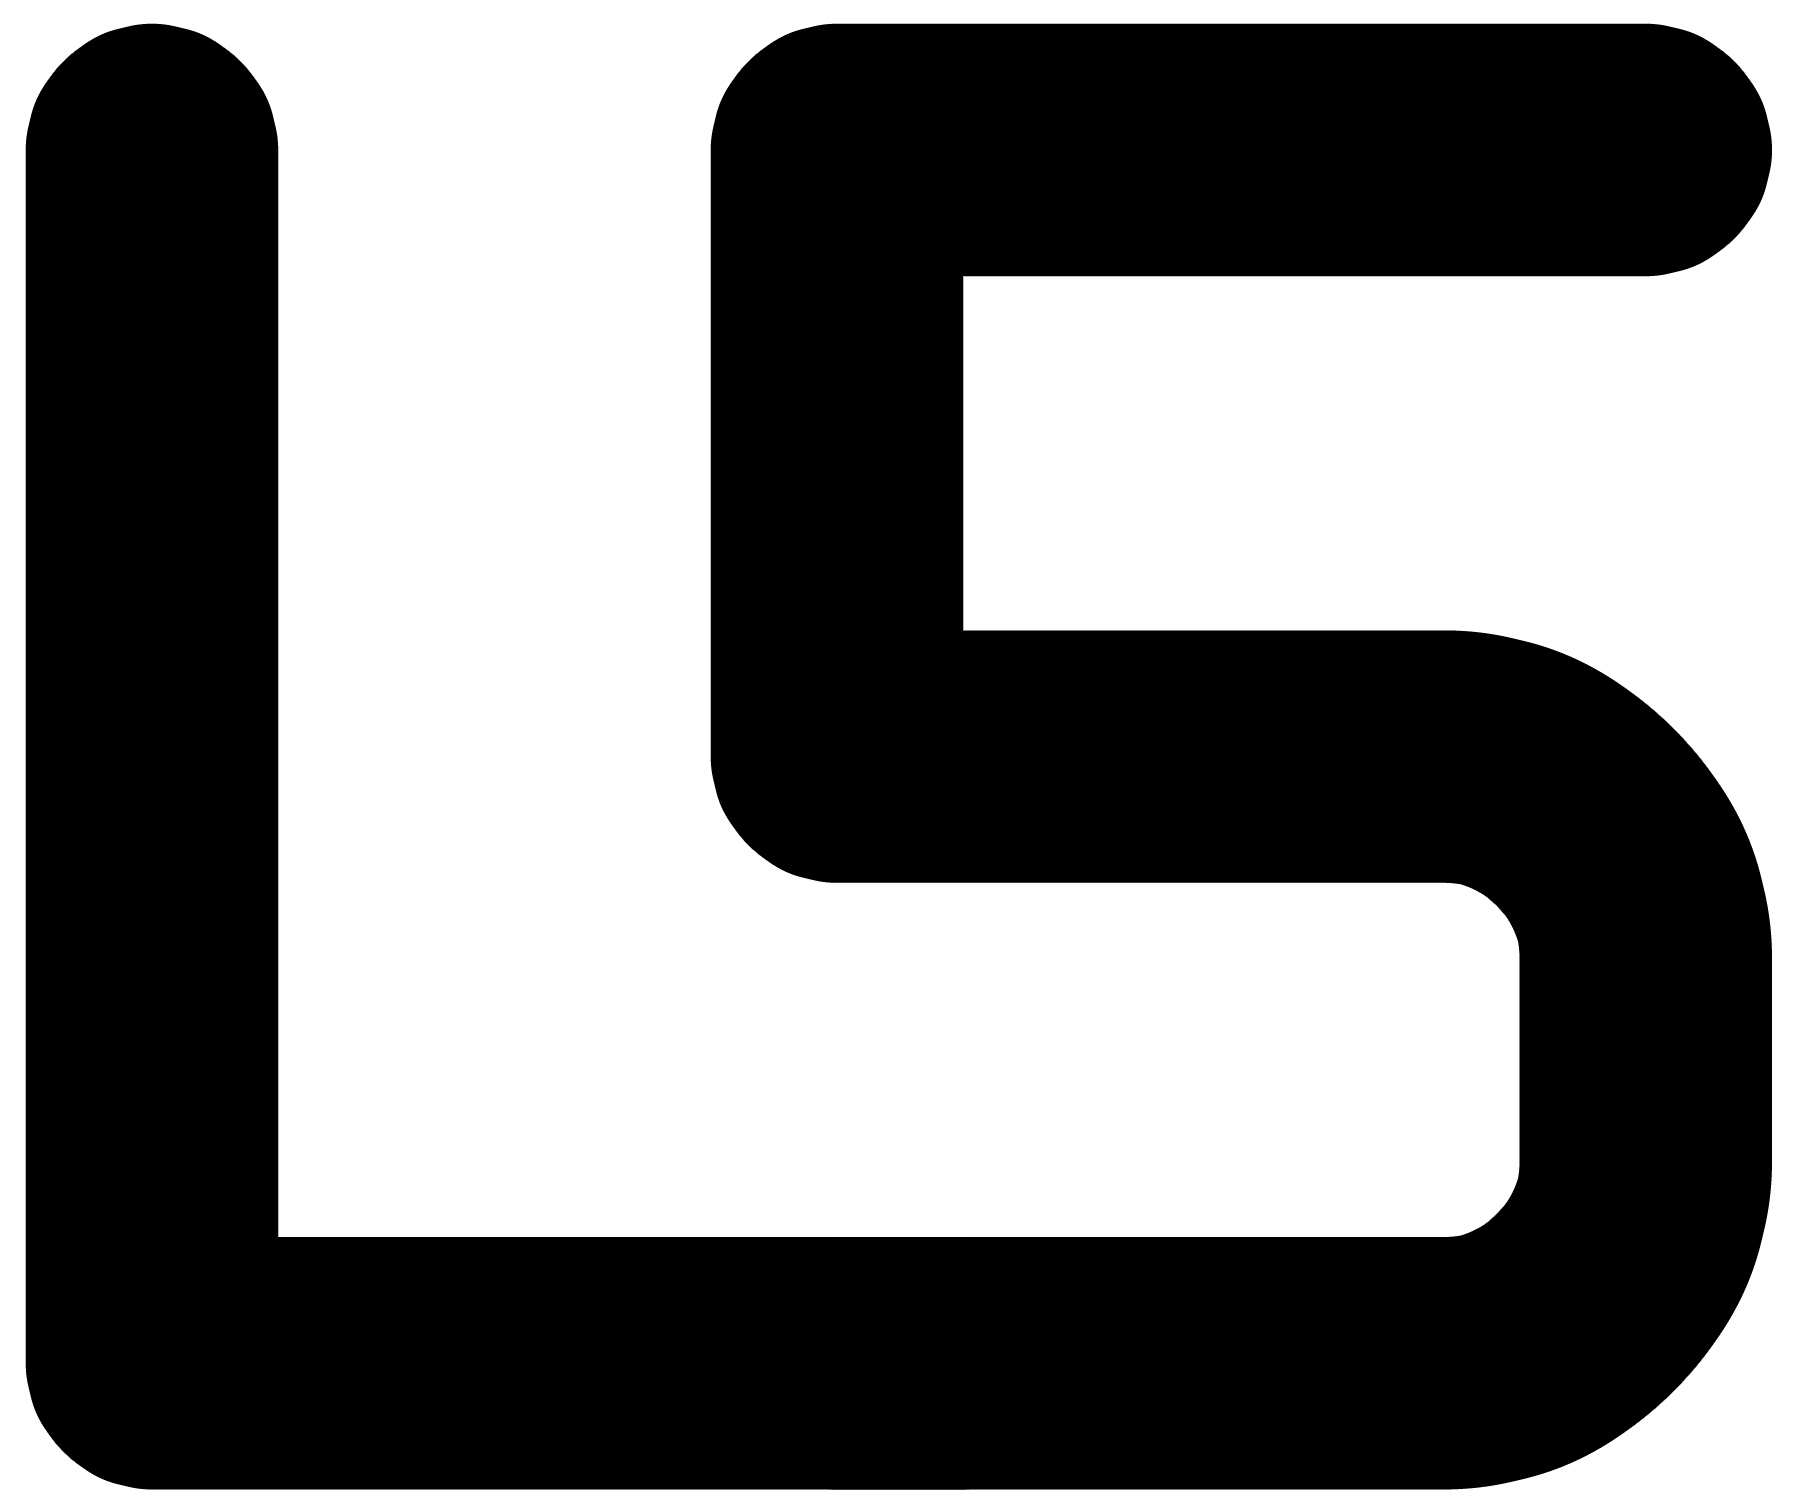 L5_Logo_Black.png